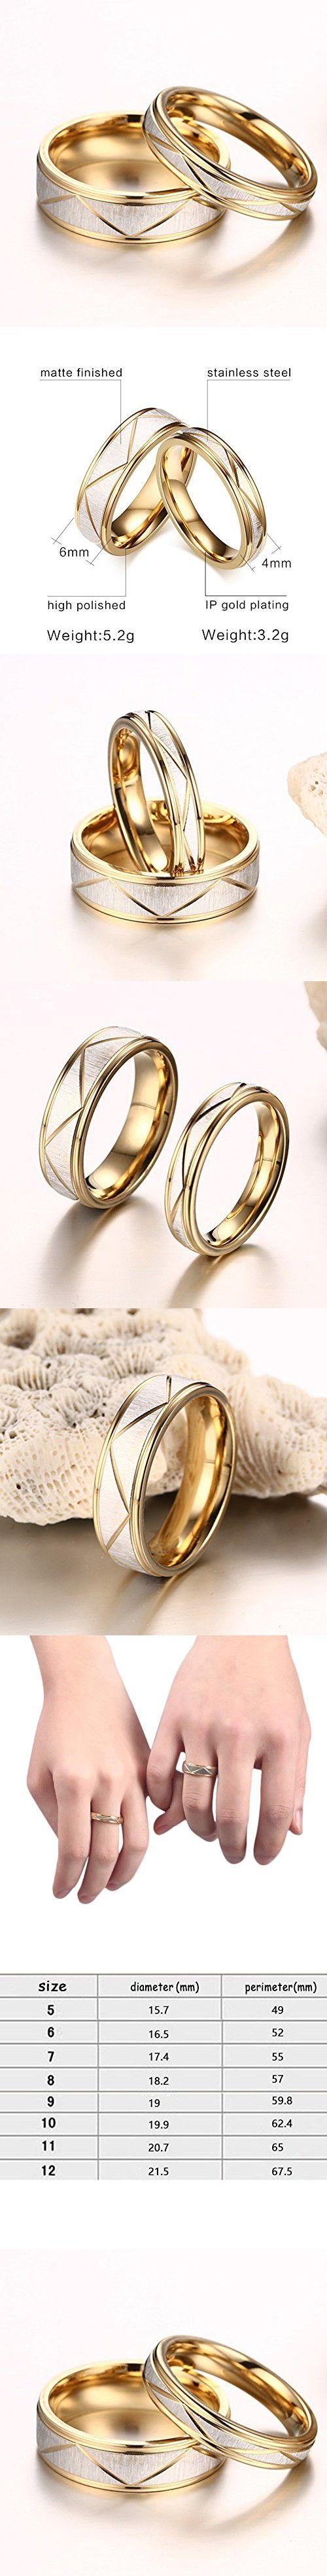 Chryssa Youree Titanium Steel Gold Couples Promise Ring Romantic